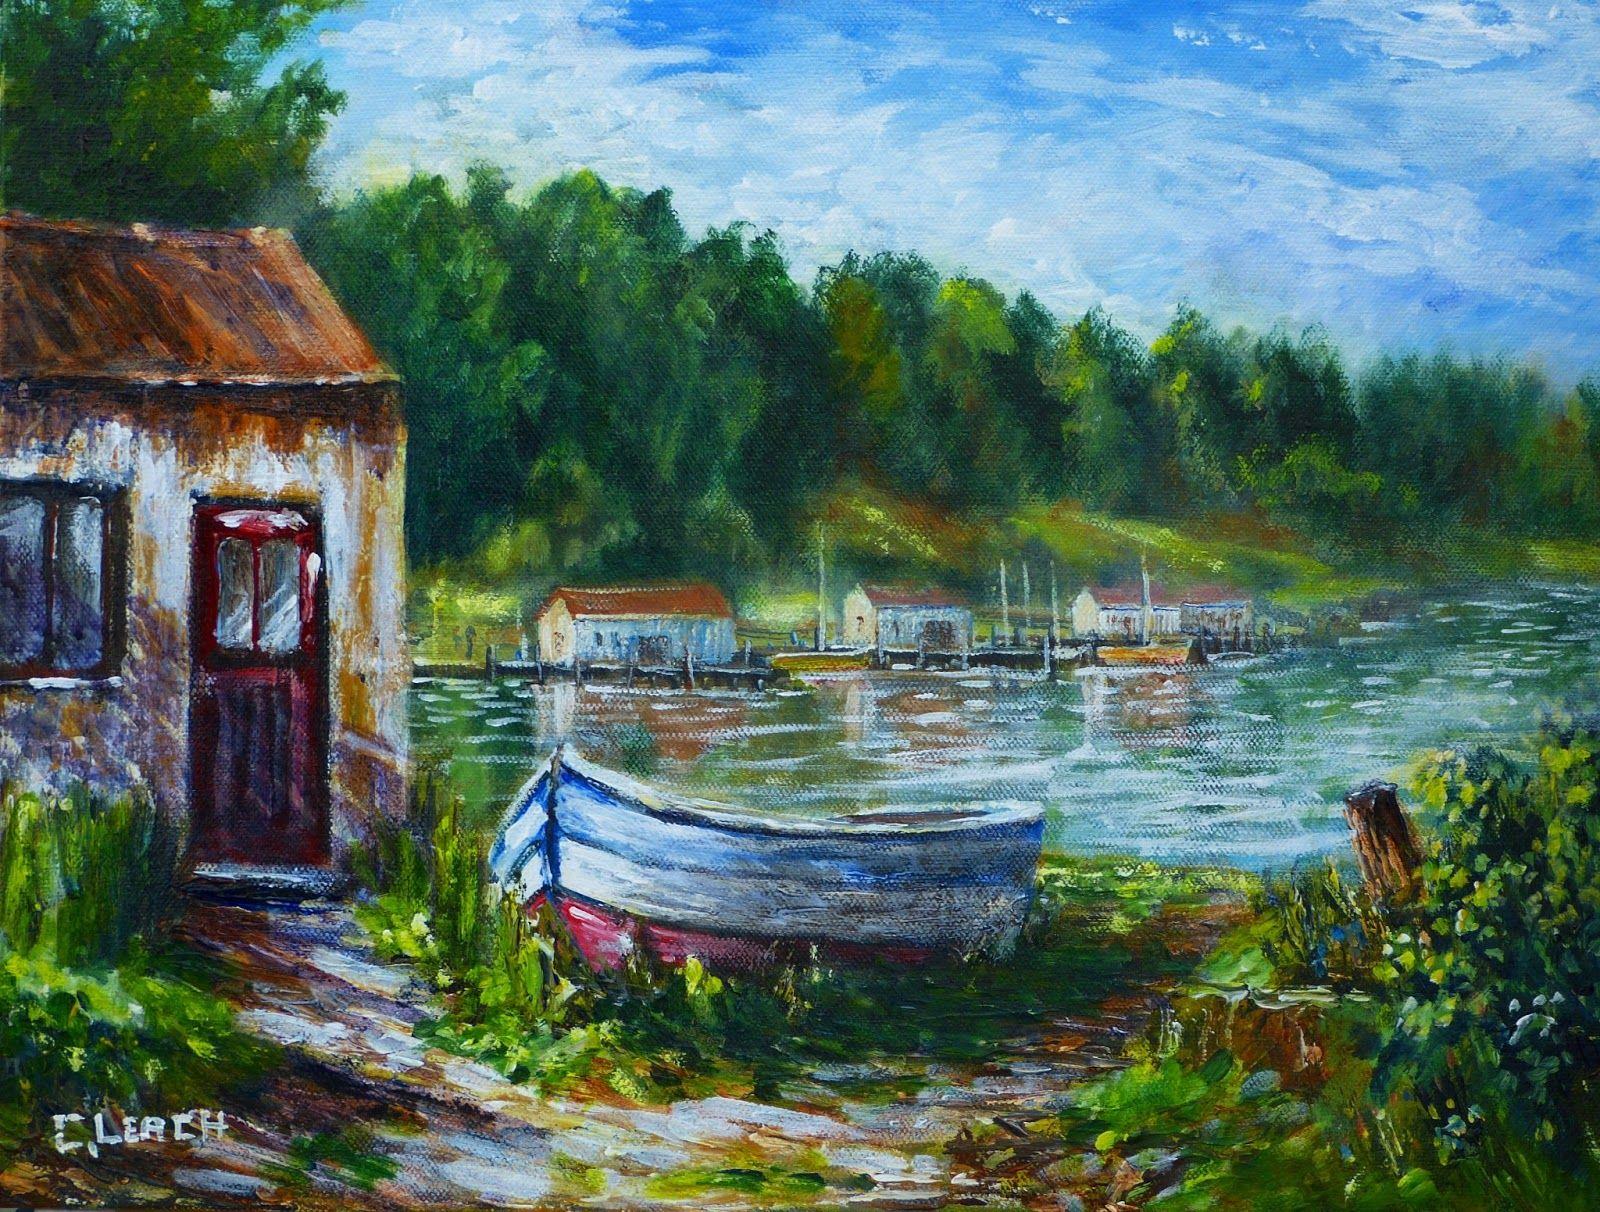 Landscape Paintings Acrylic At Duckduckgo Landscape Paintings Acrylic Landscape Paintings Landscape Art